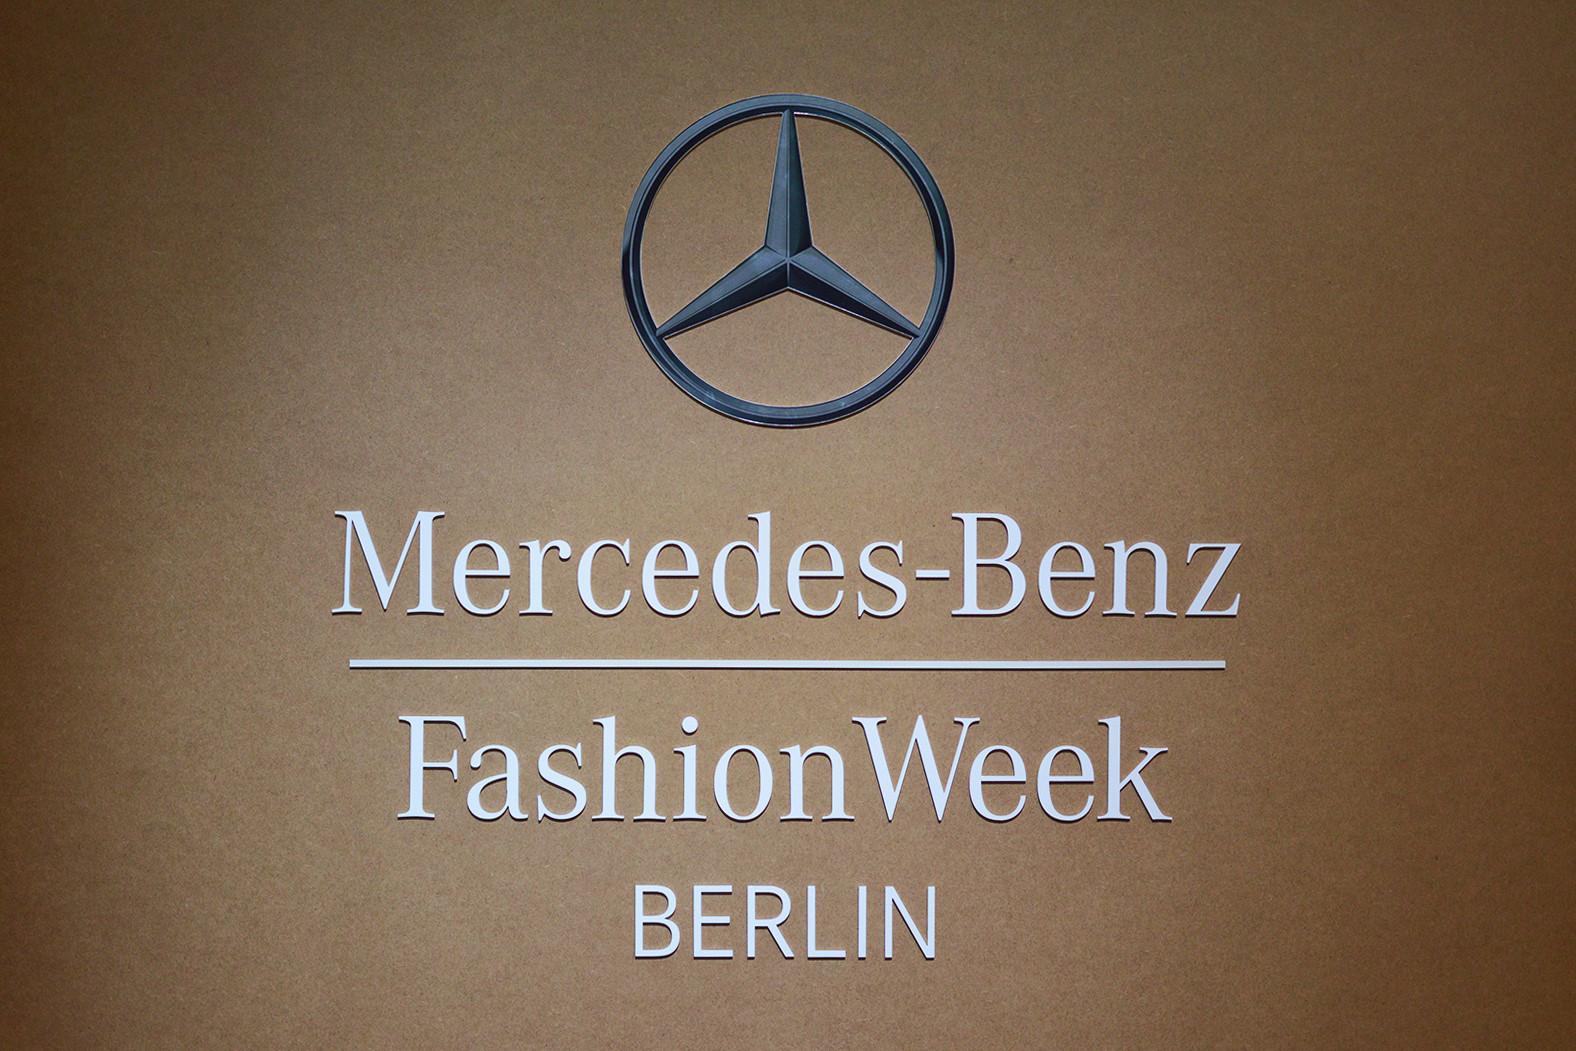 MercedesB